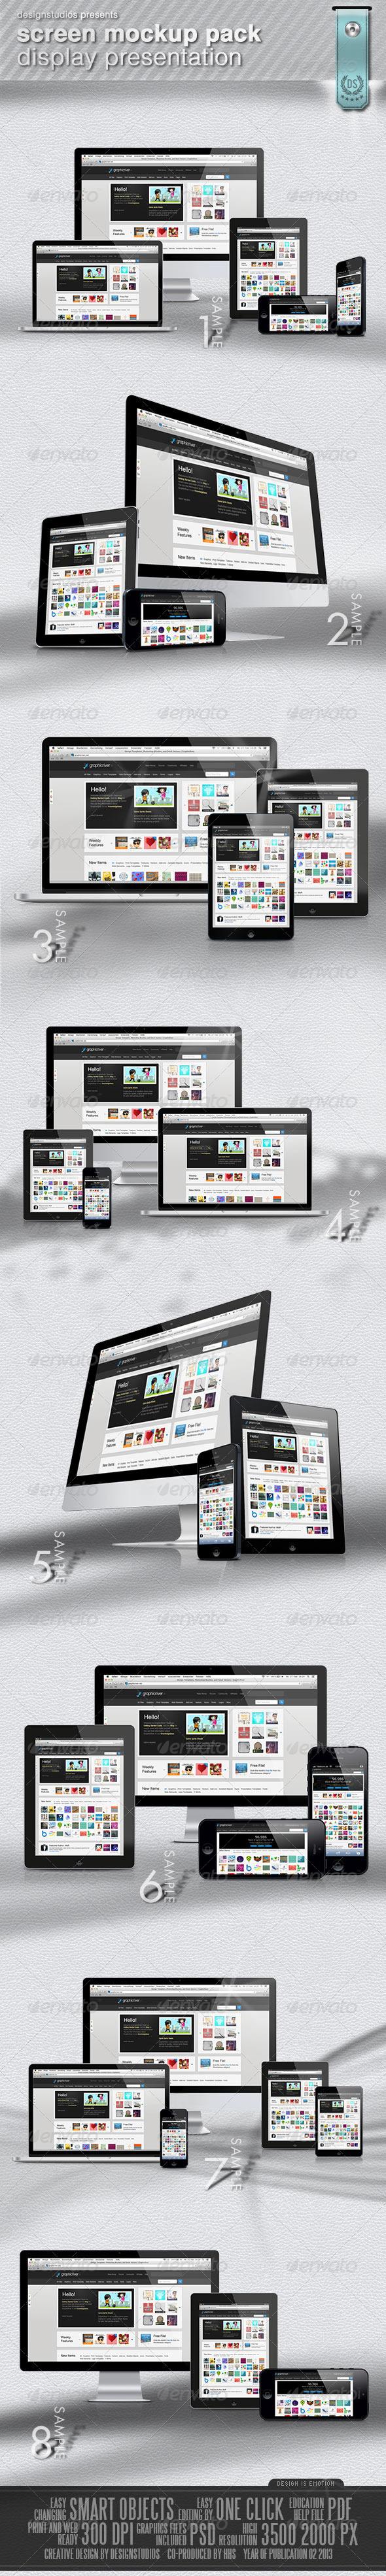 Screen MockUp Pack Display Presentation